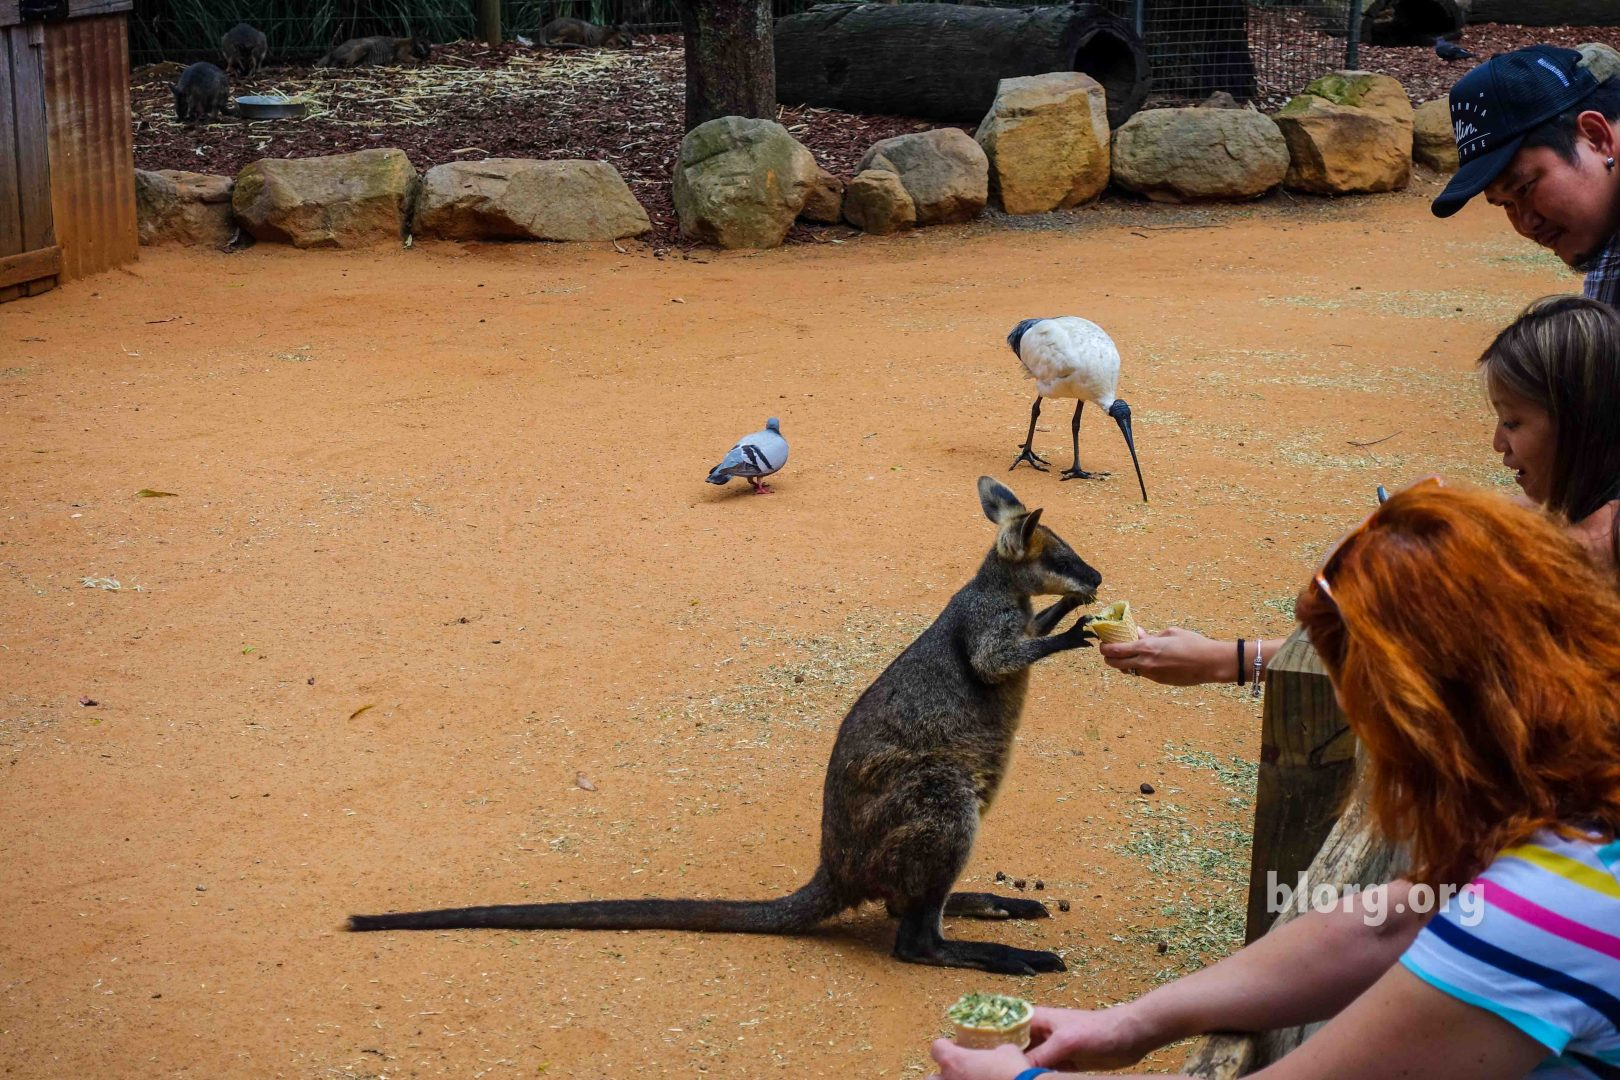 feeding baby kangaroo